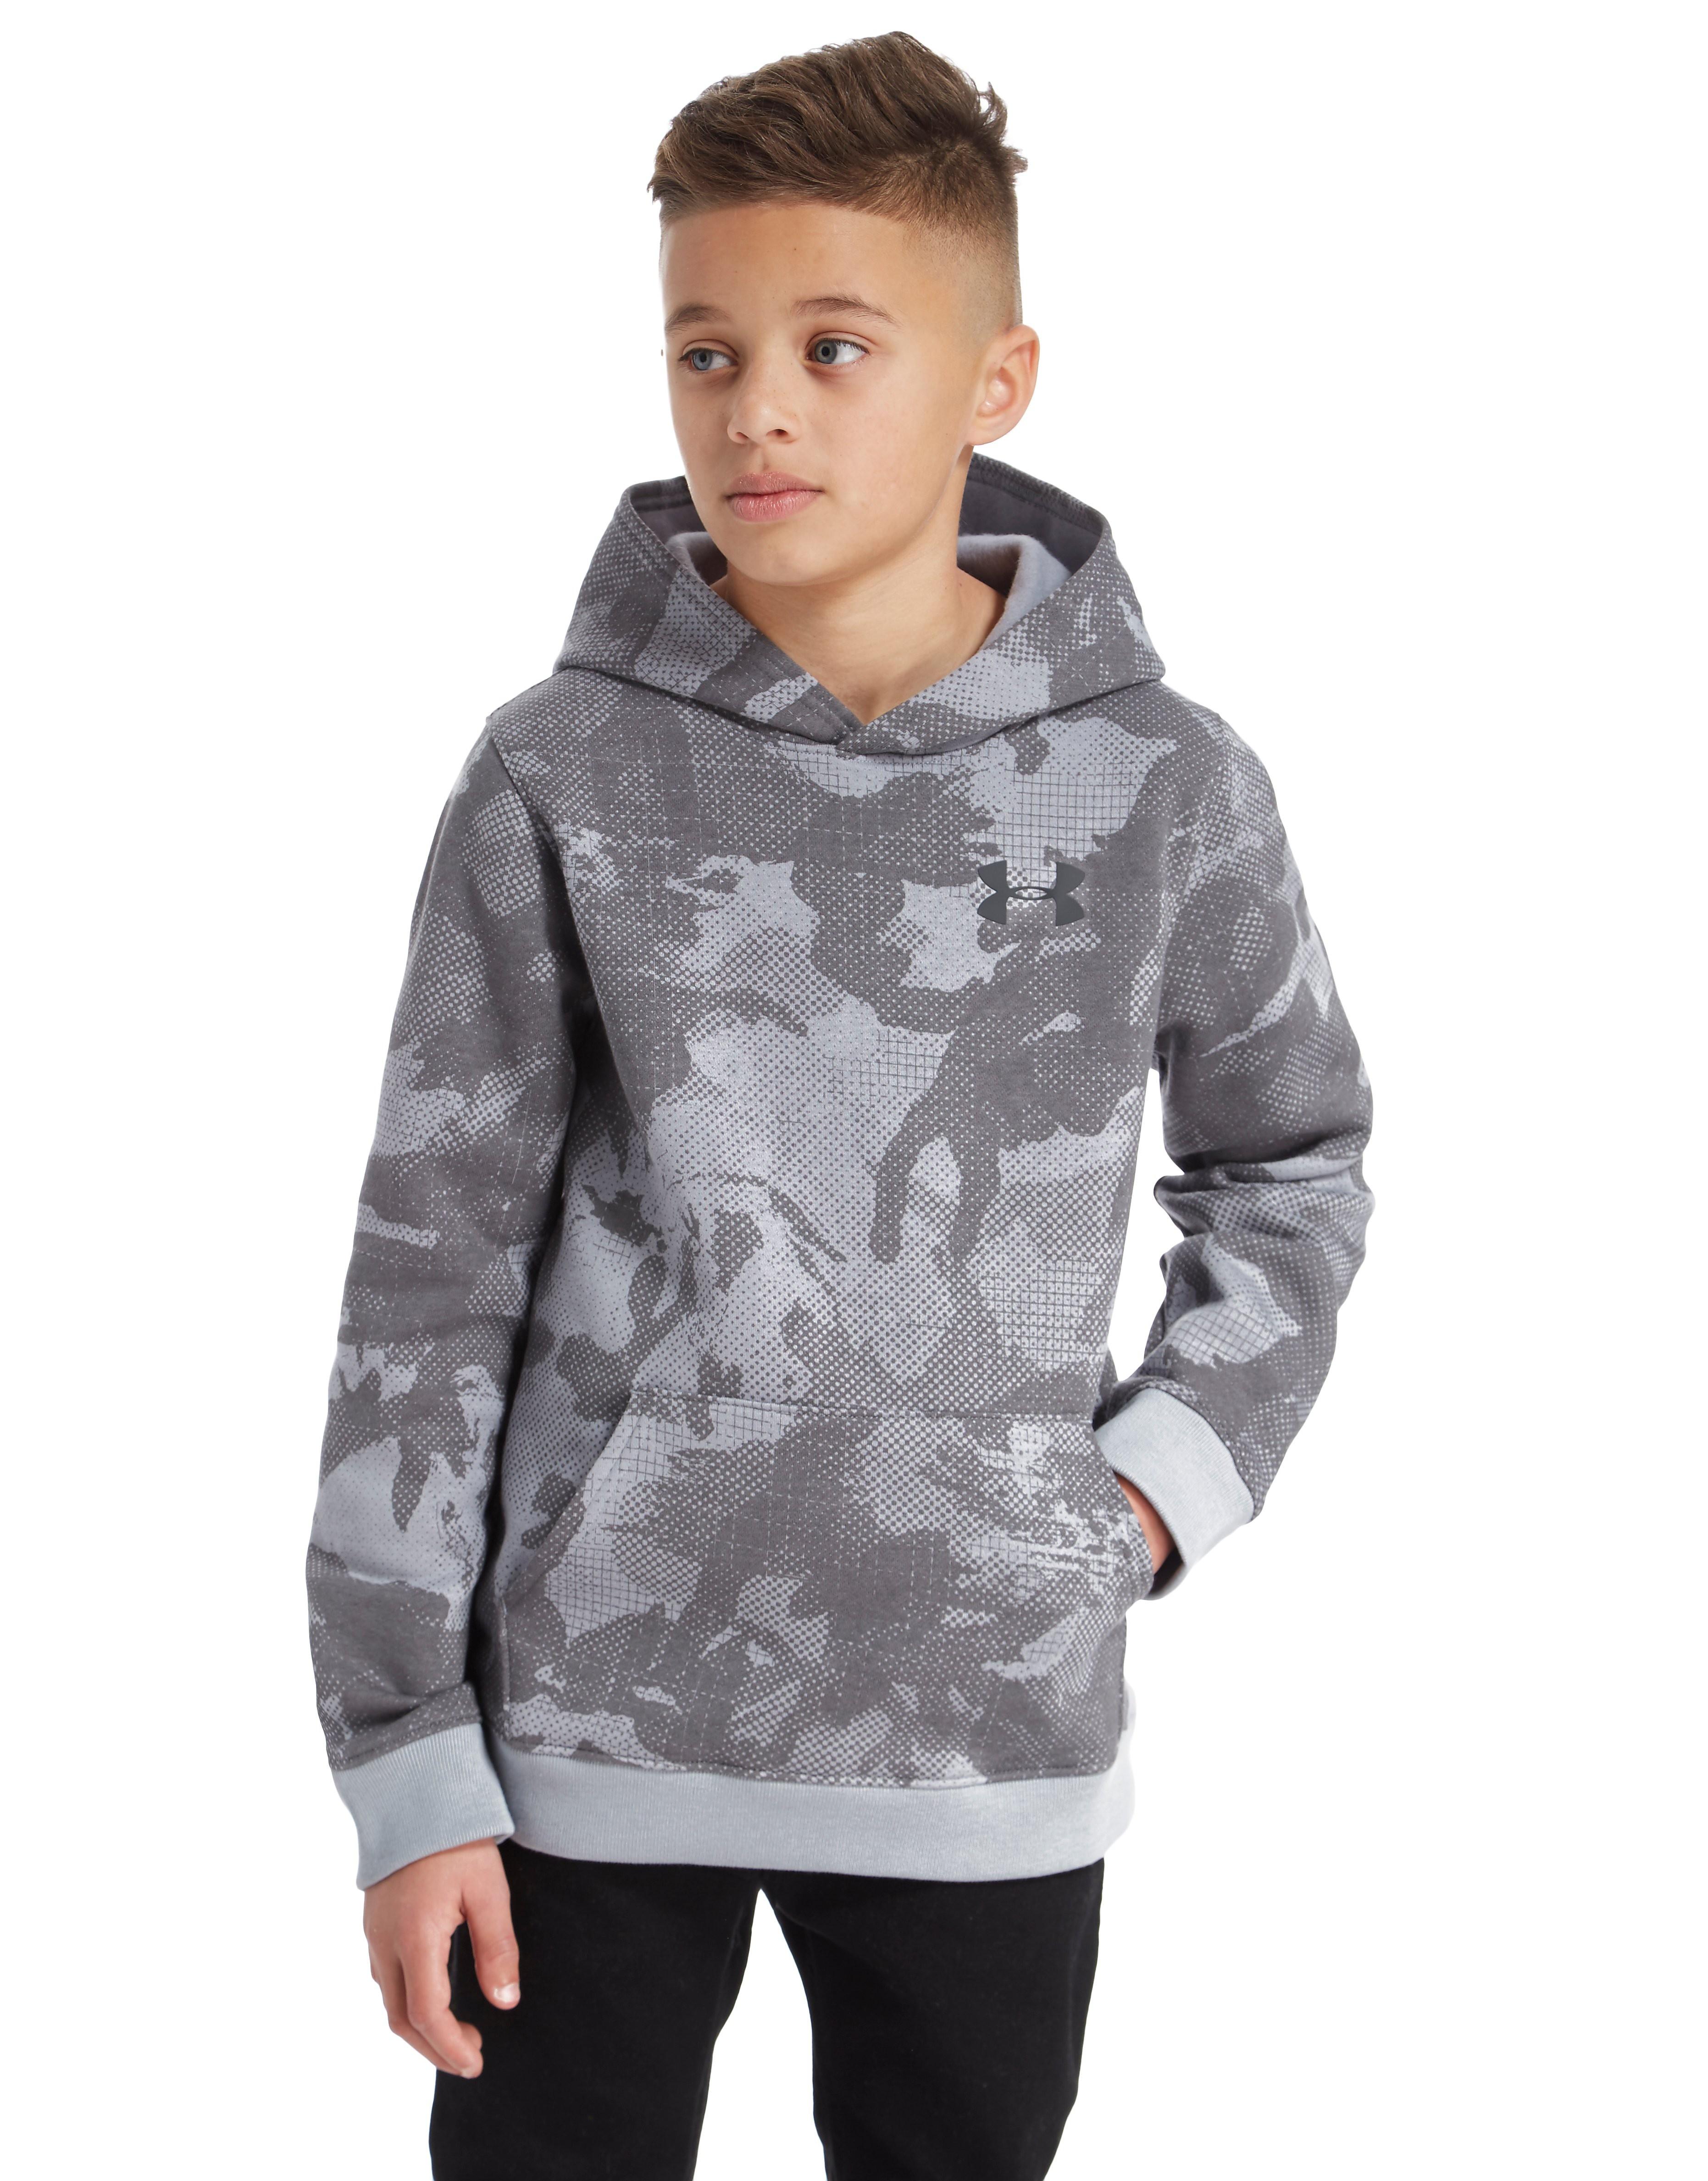 Under Armour Titan Fleece Printed Hoody Junior